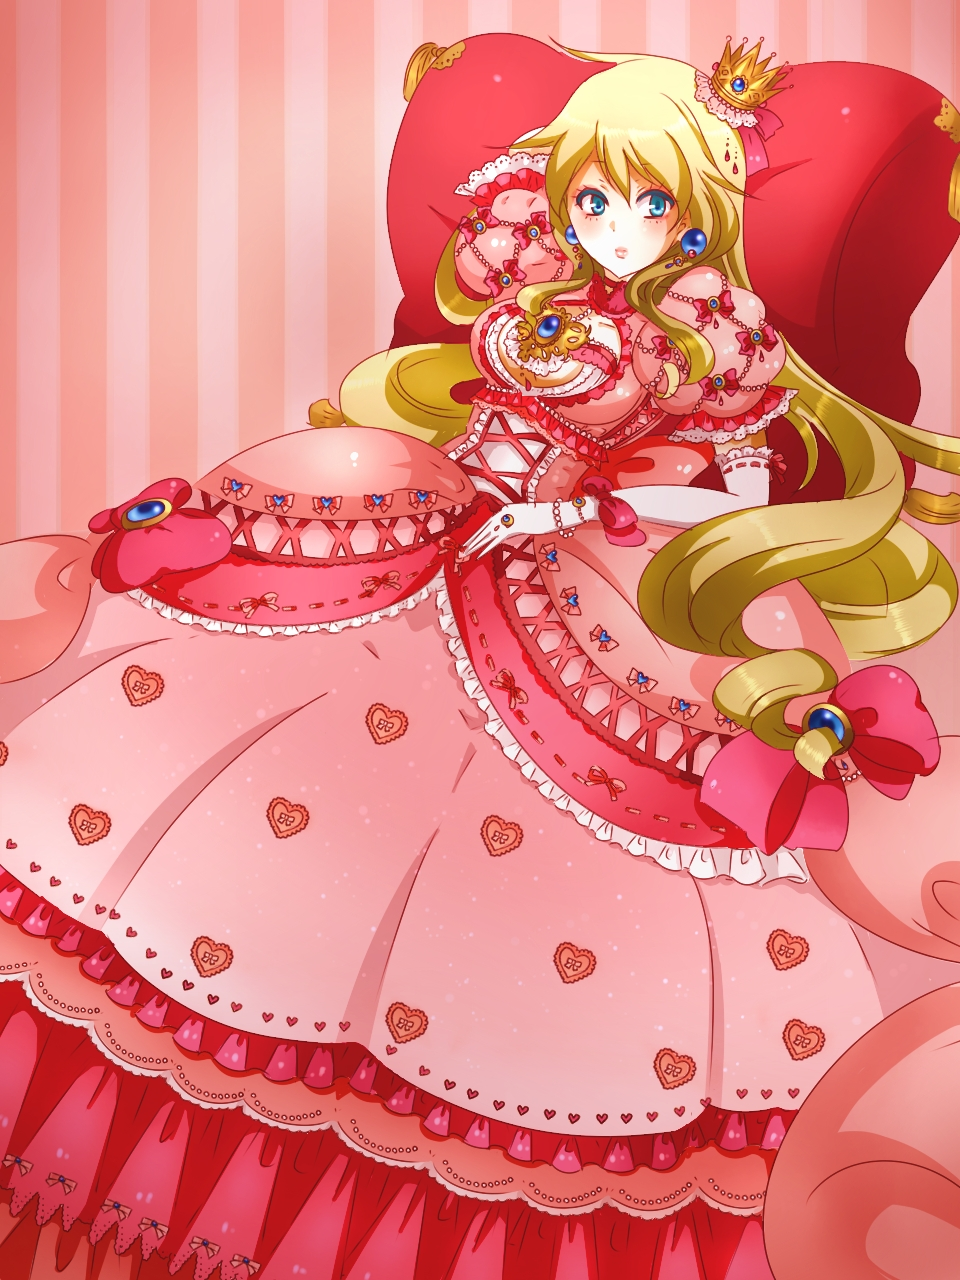 Princess Peach - Super Mario Bros. - Image #1252115 - Zerochan Anime ...